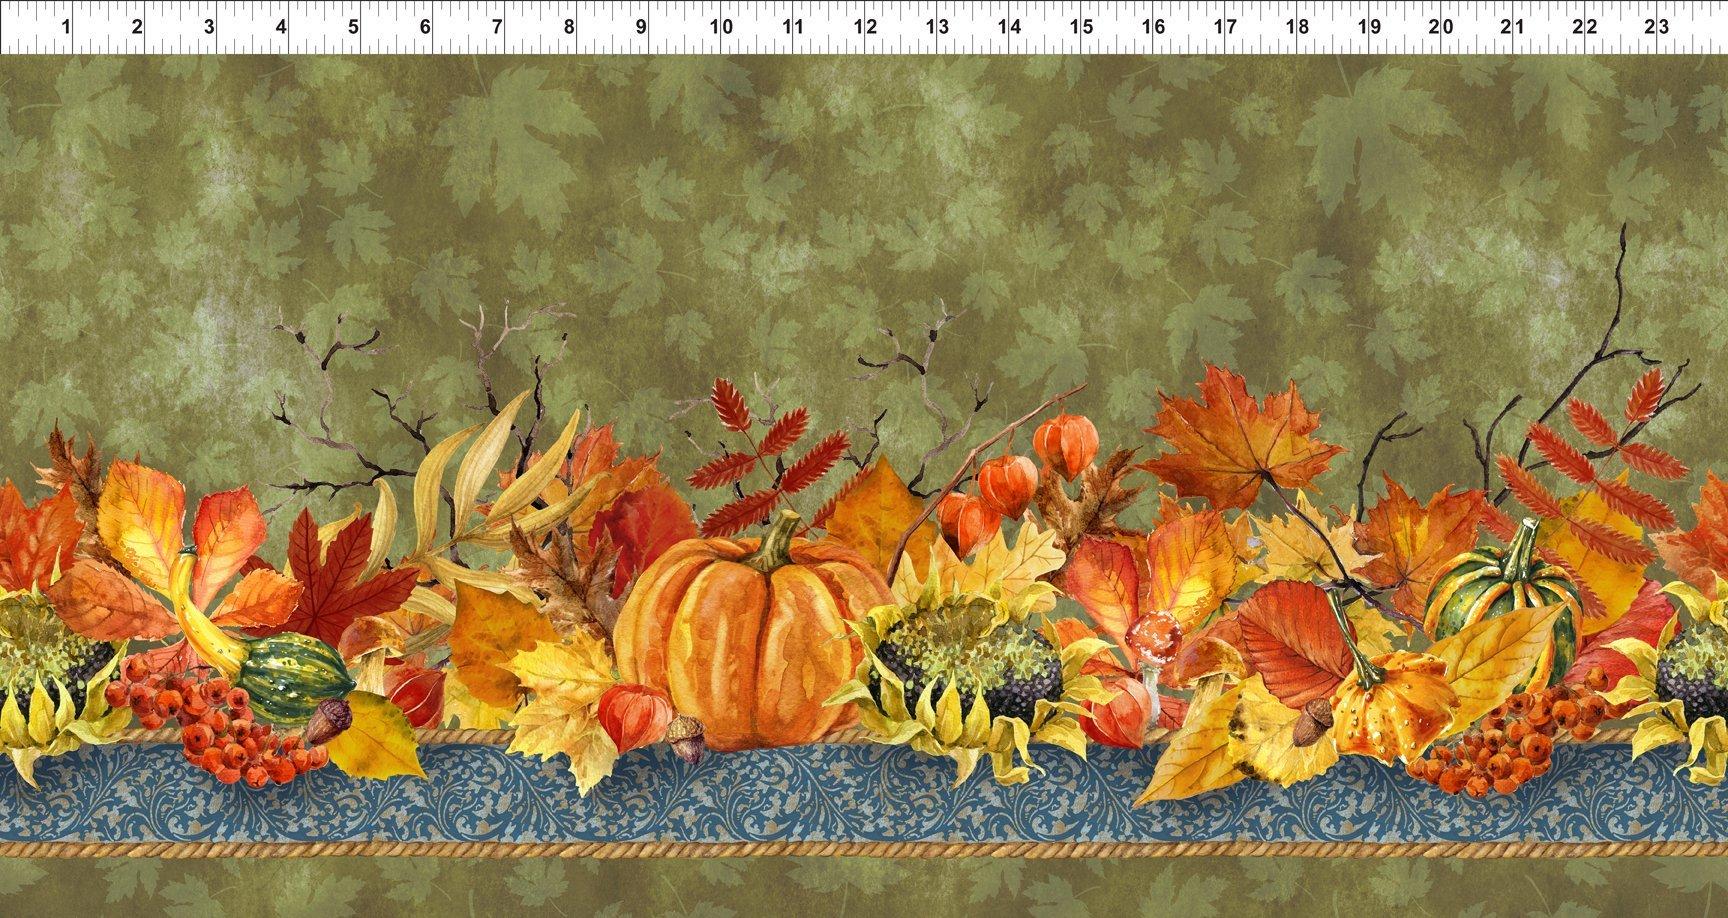 Our Autumn Friends - pumpkin & leaf border stripe